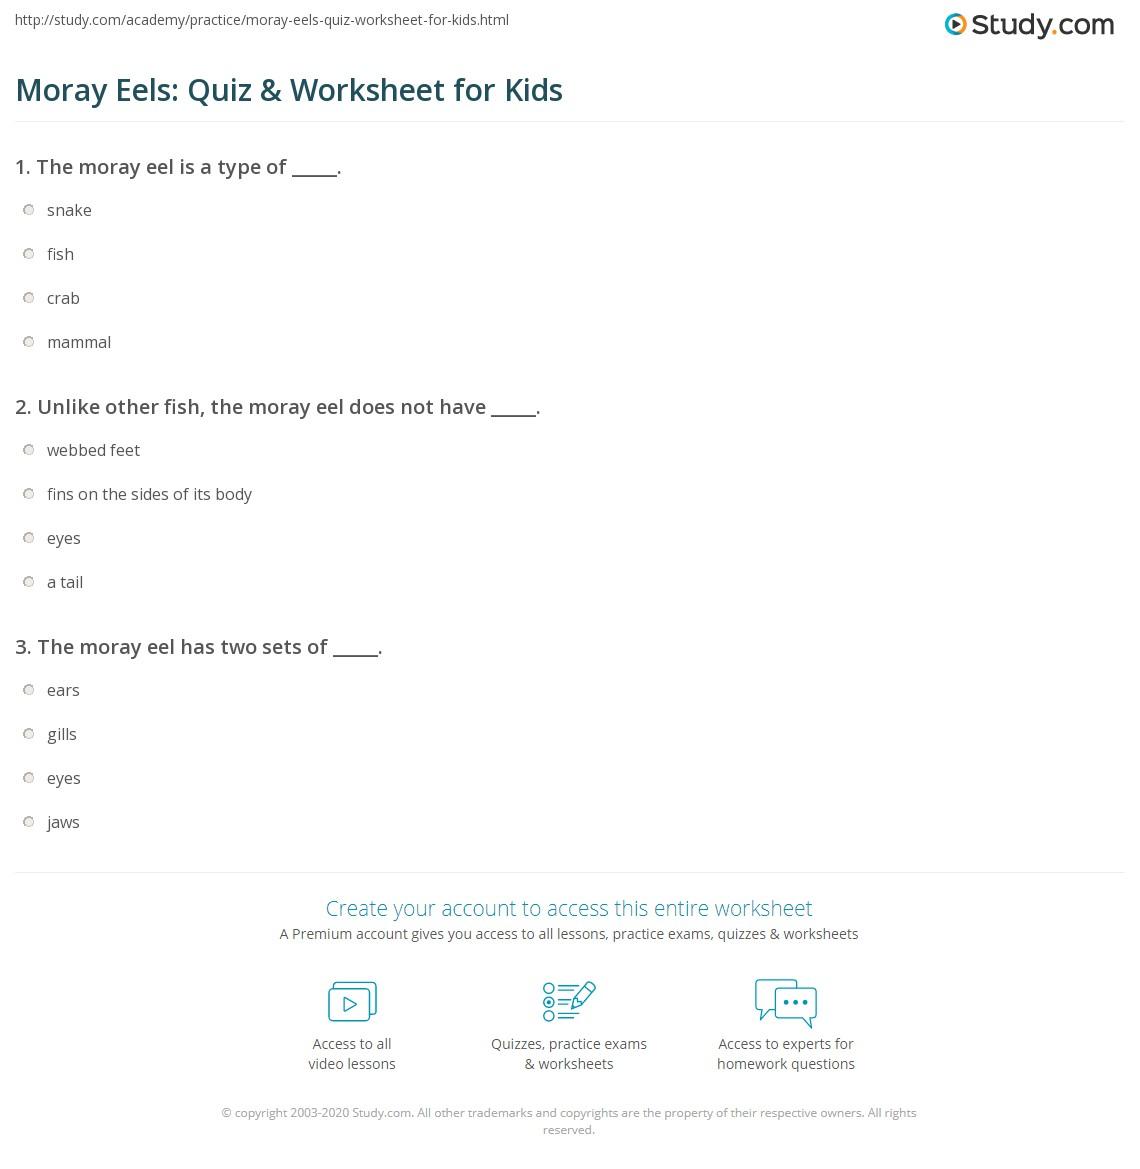 Moray Eels: Quiz & Worksheet for Kids | Study.com